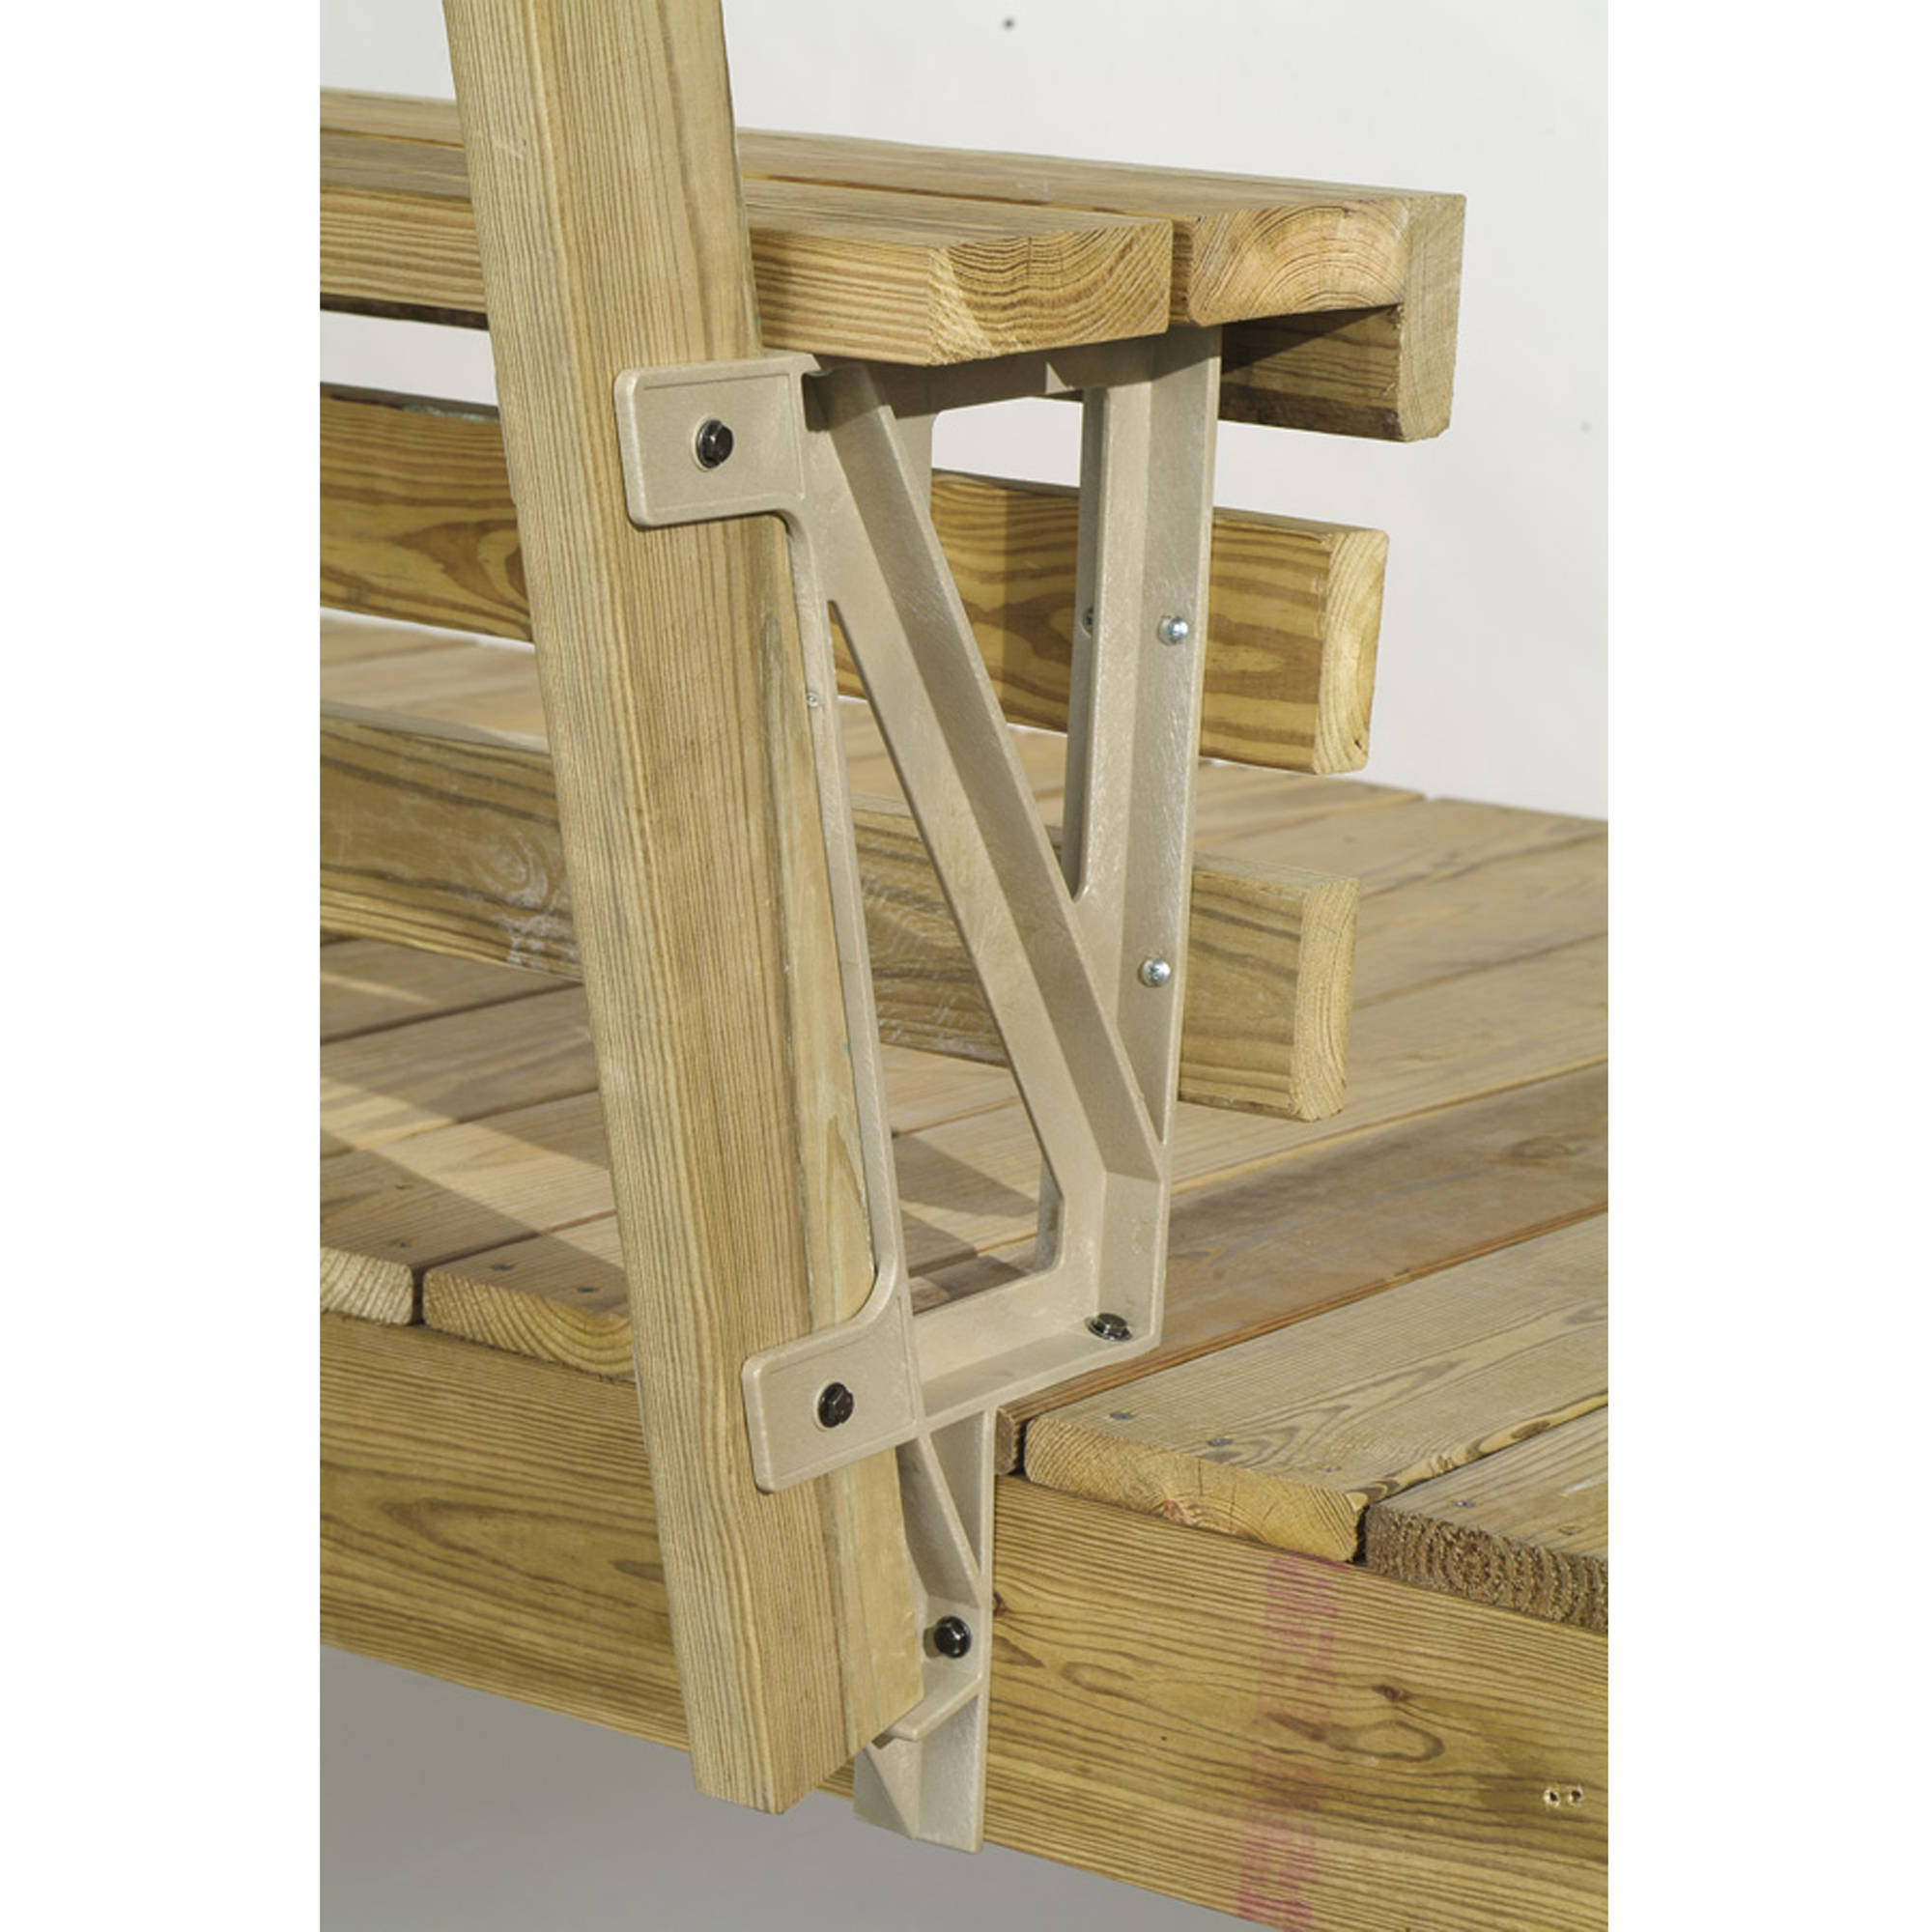 Image of 2x4 Basics Dekmate Bench Bracket, 2-Pack